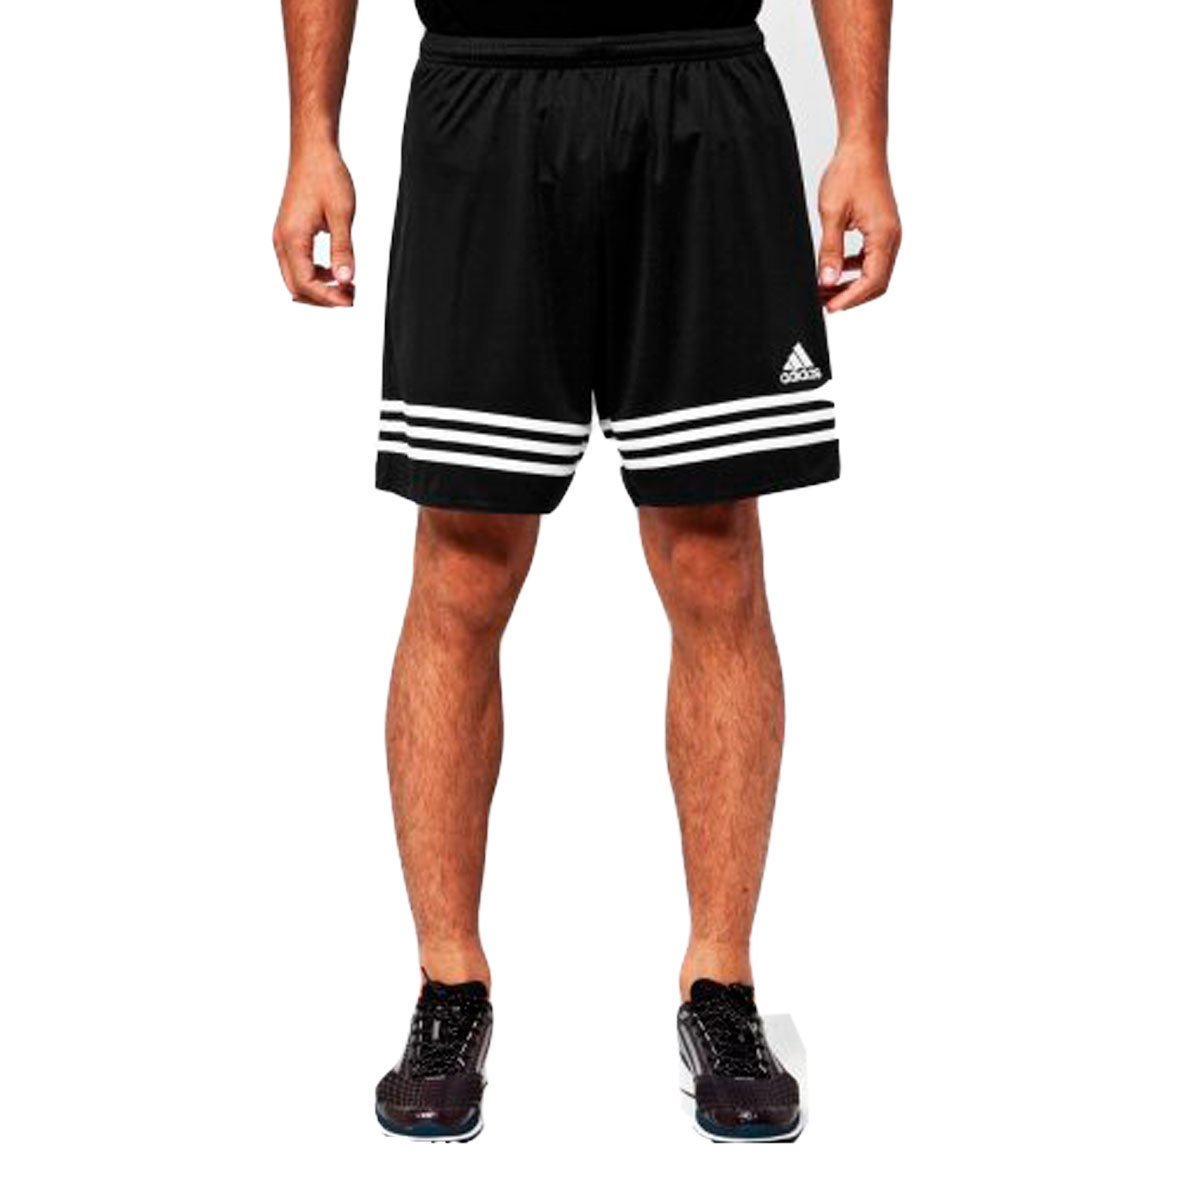 Bizz Store - Shorts Masculino Adidas Entrada 14 Futebol c4c8dd6e6f9